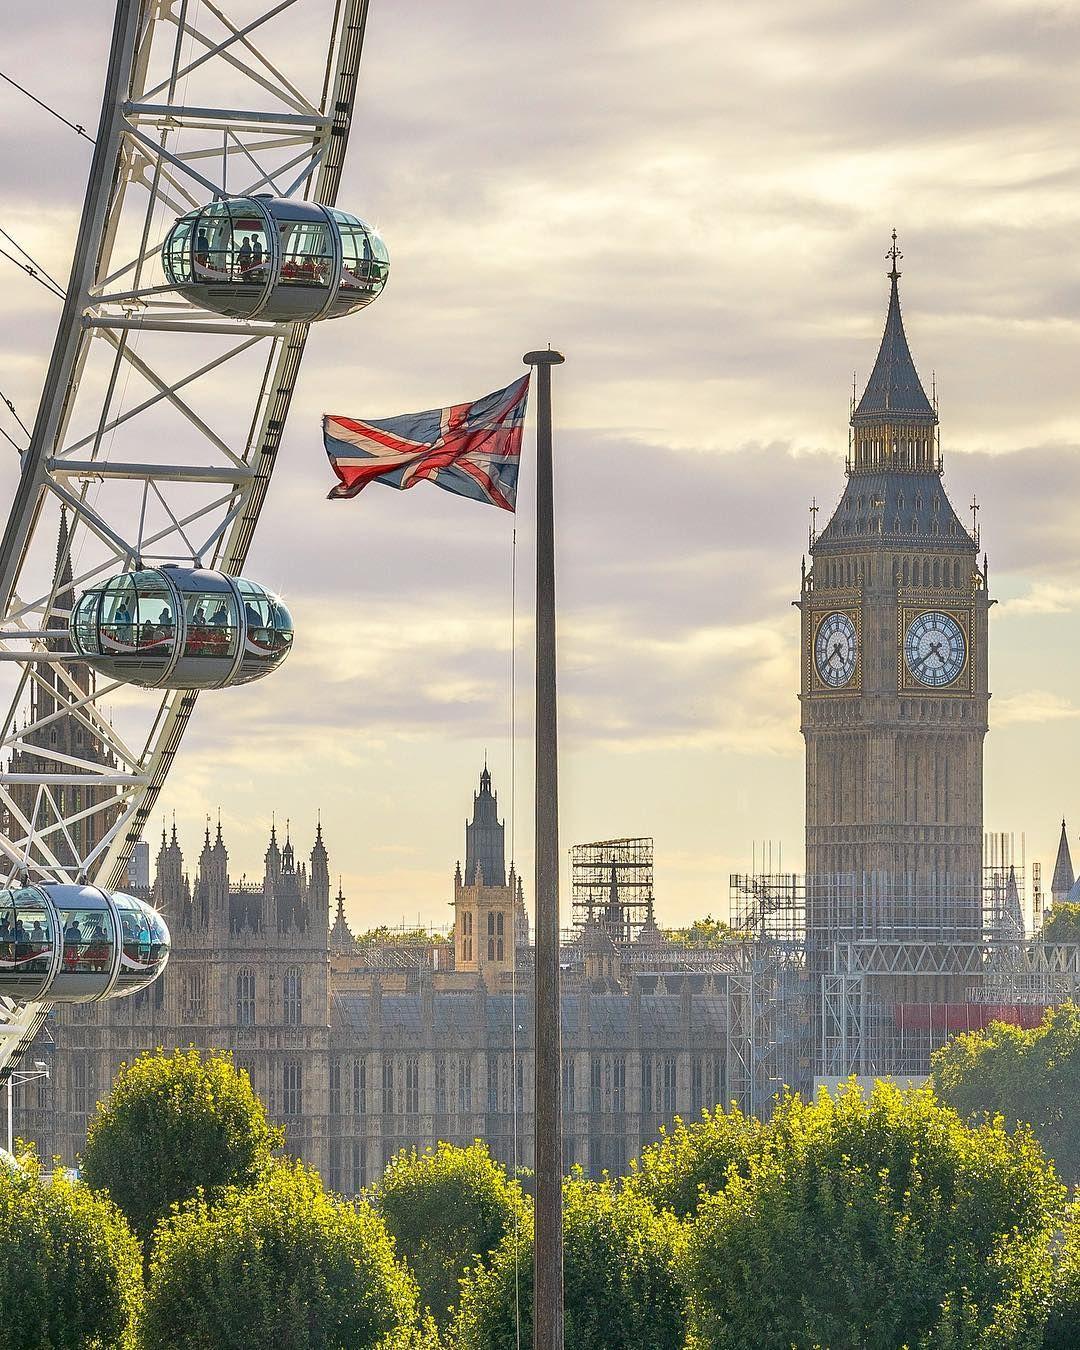 London London Europe And Travel London City London